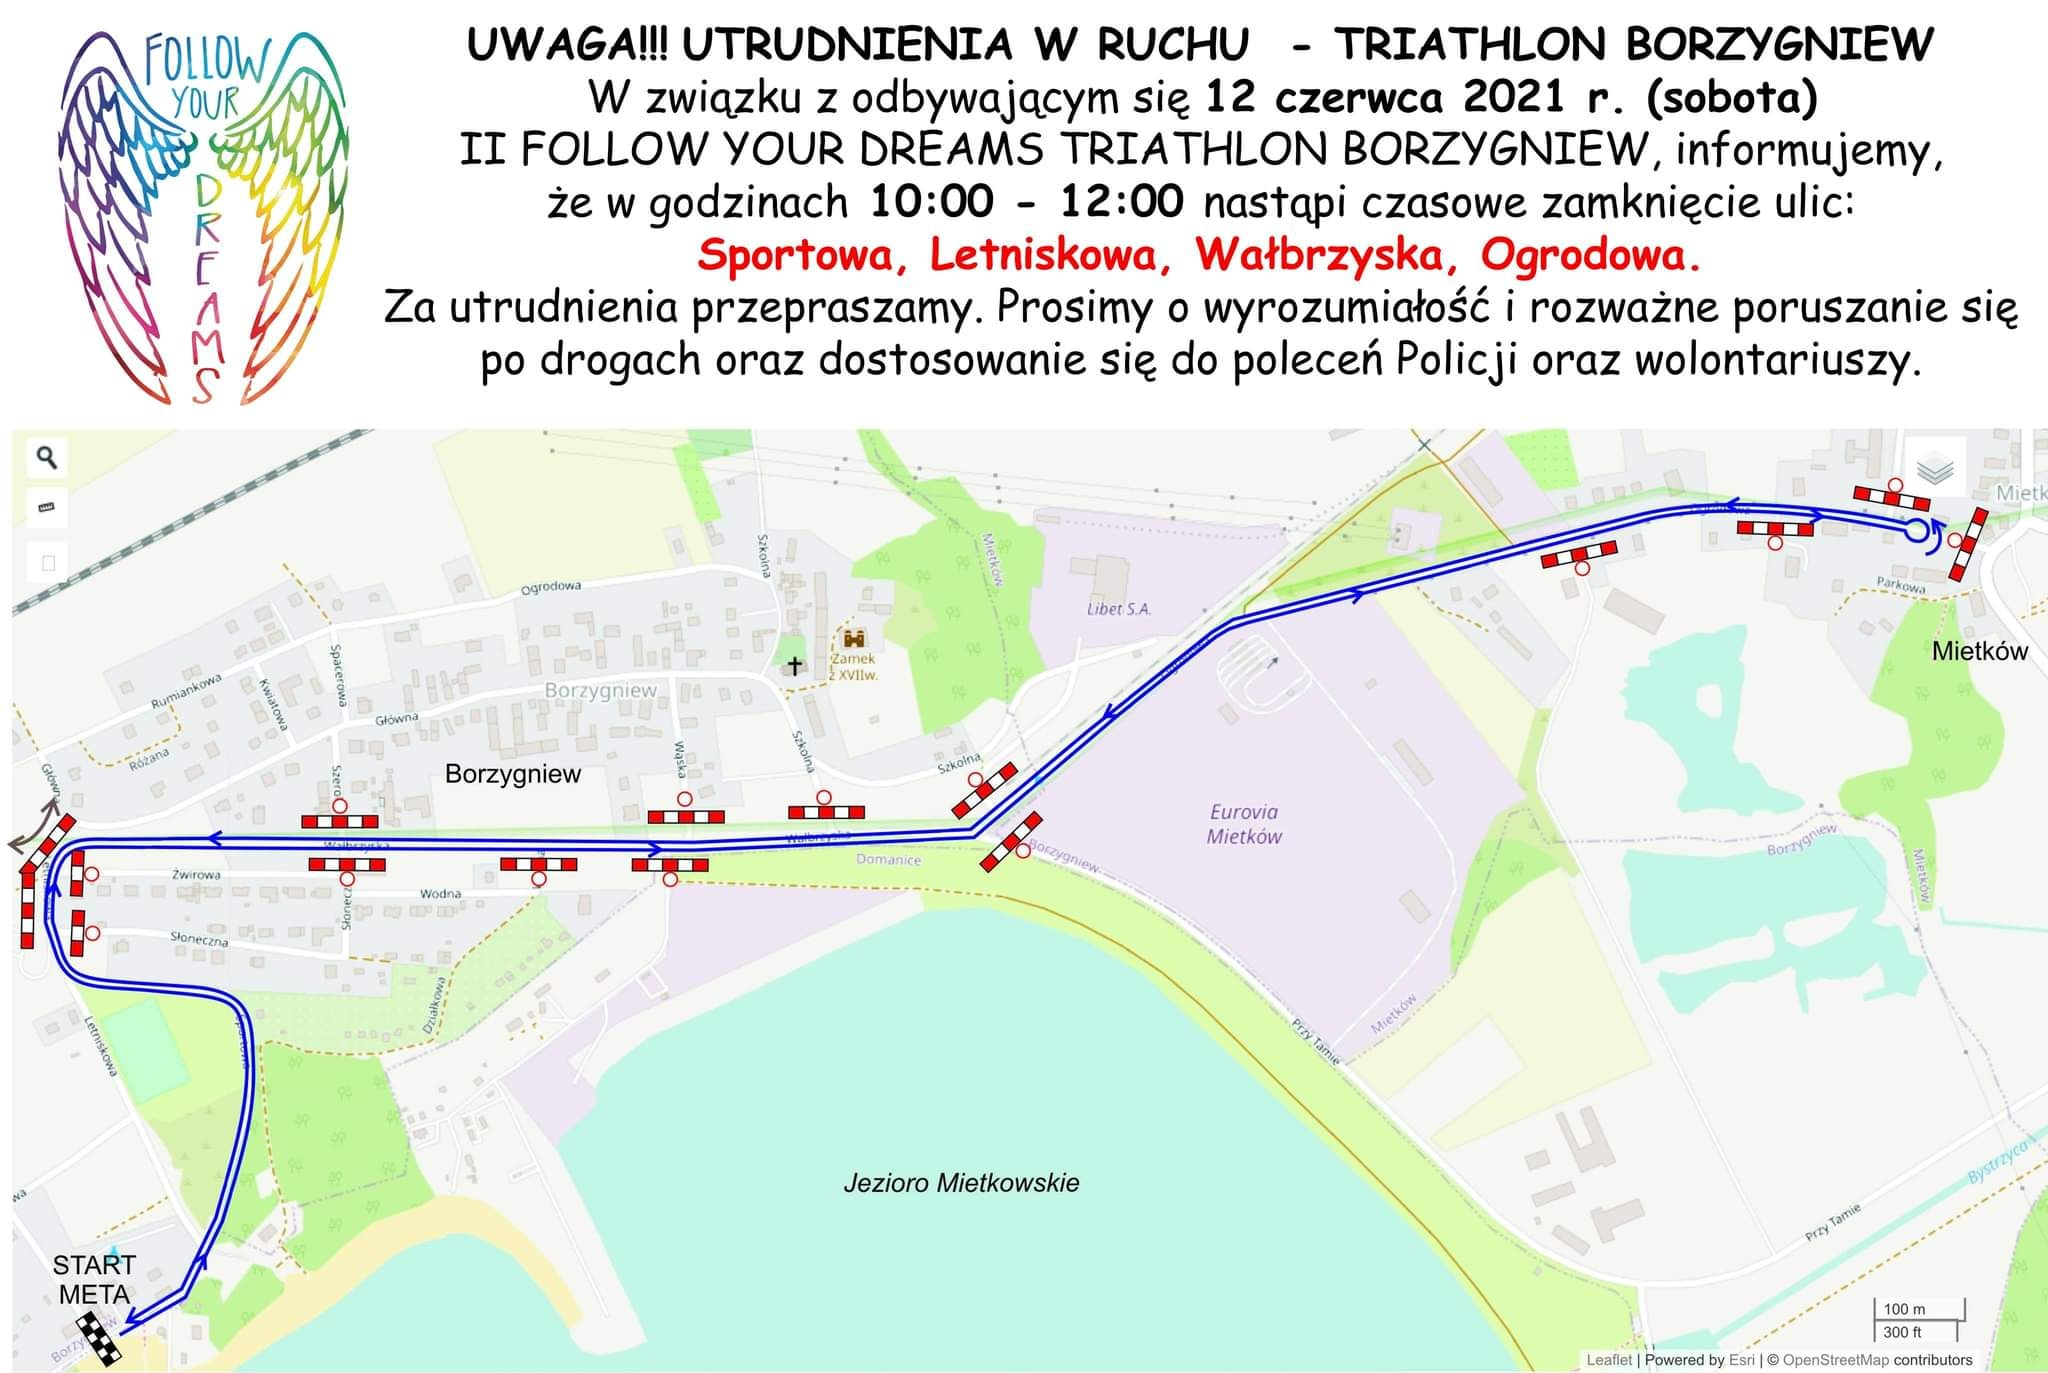 Triathlon 2021 plakat mapa zamknięte drogi